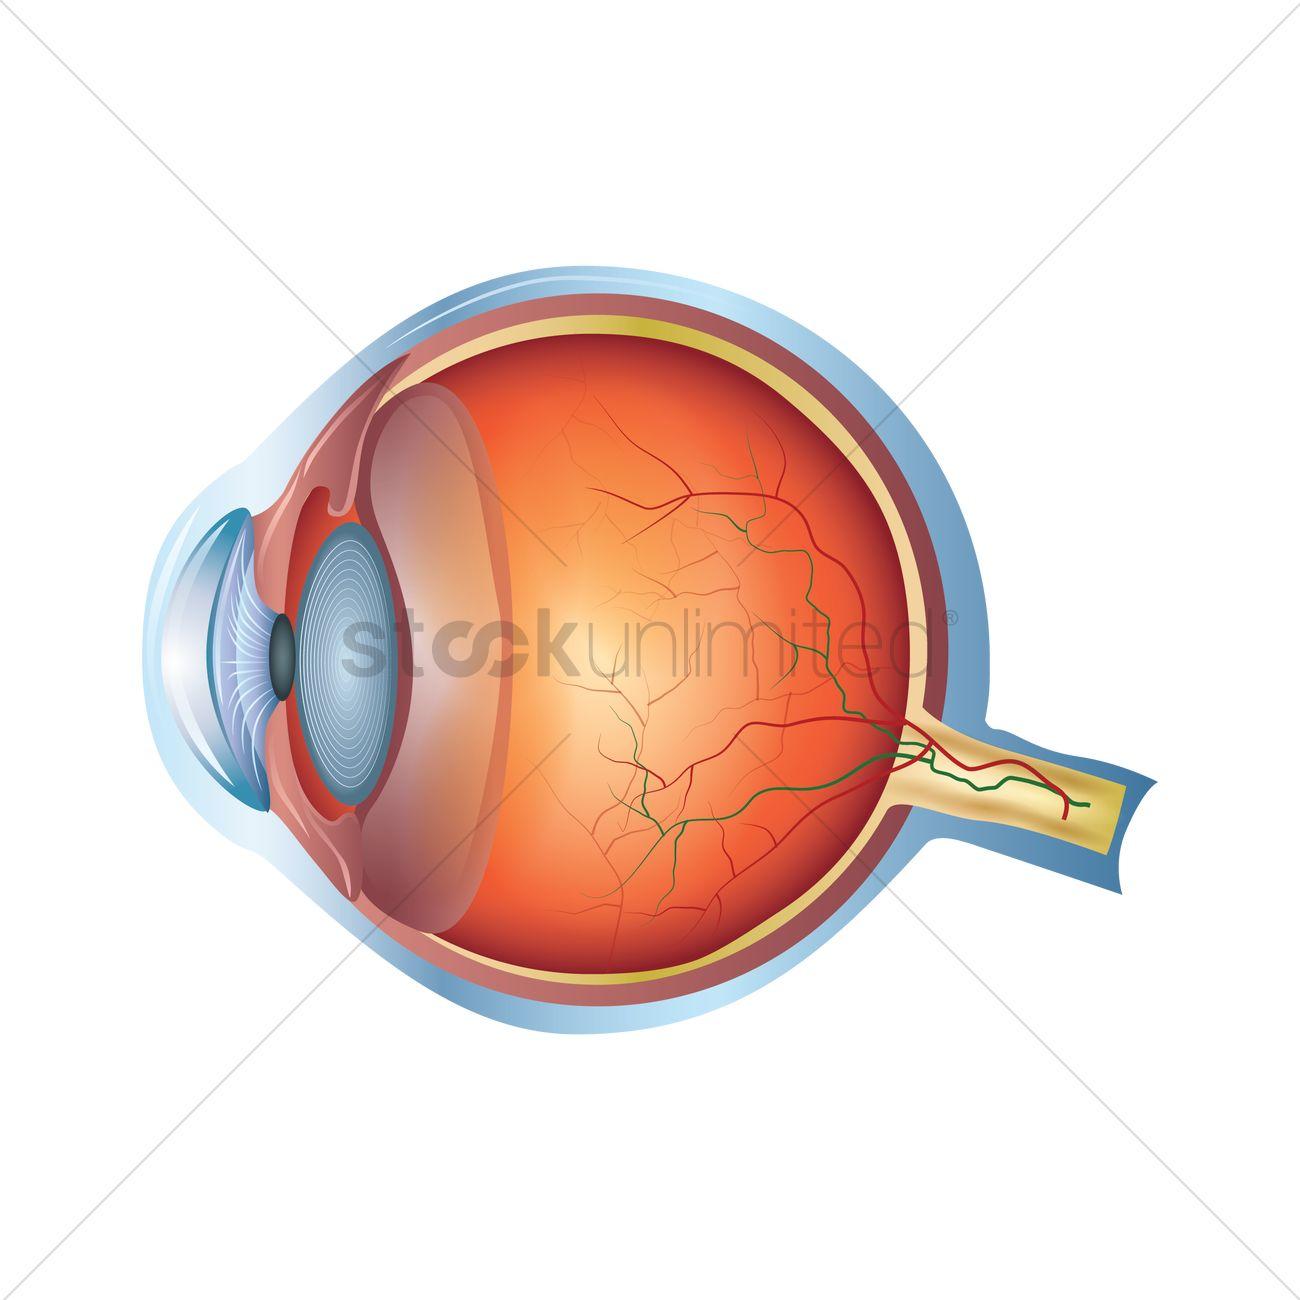 Human anatomy eyes